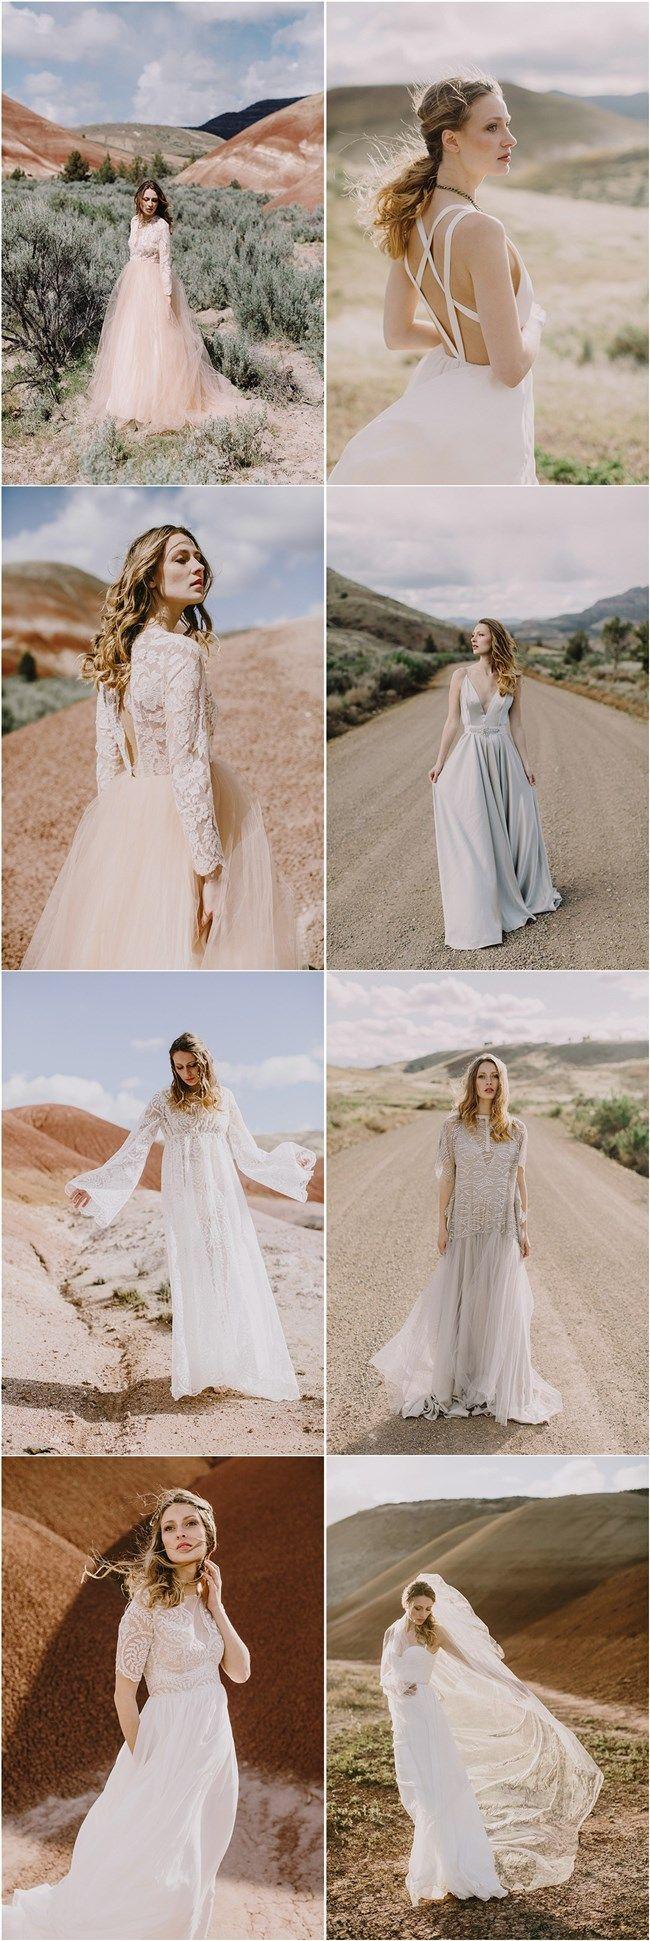 Wedding Dresses Spanish Fork Utah : Elizabeth dye wedding dresses collection